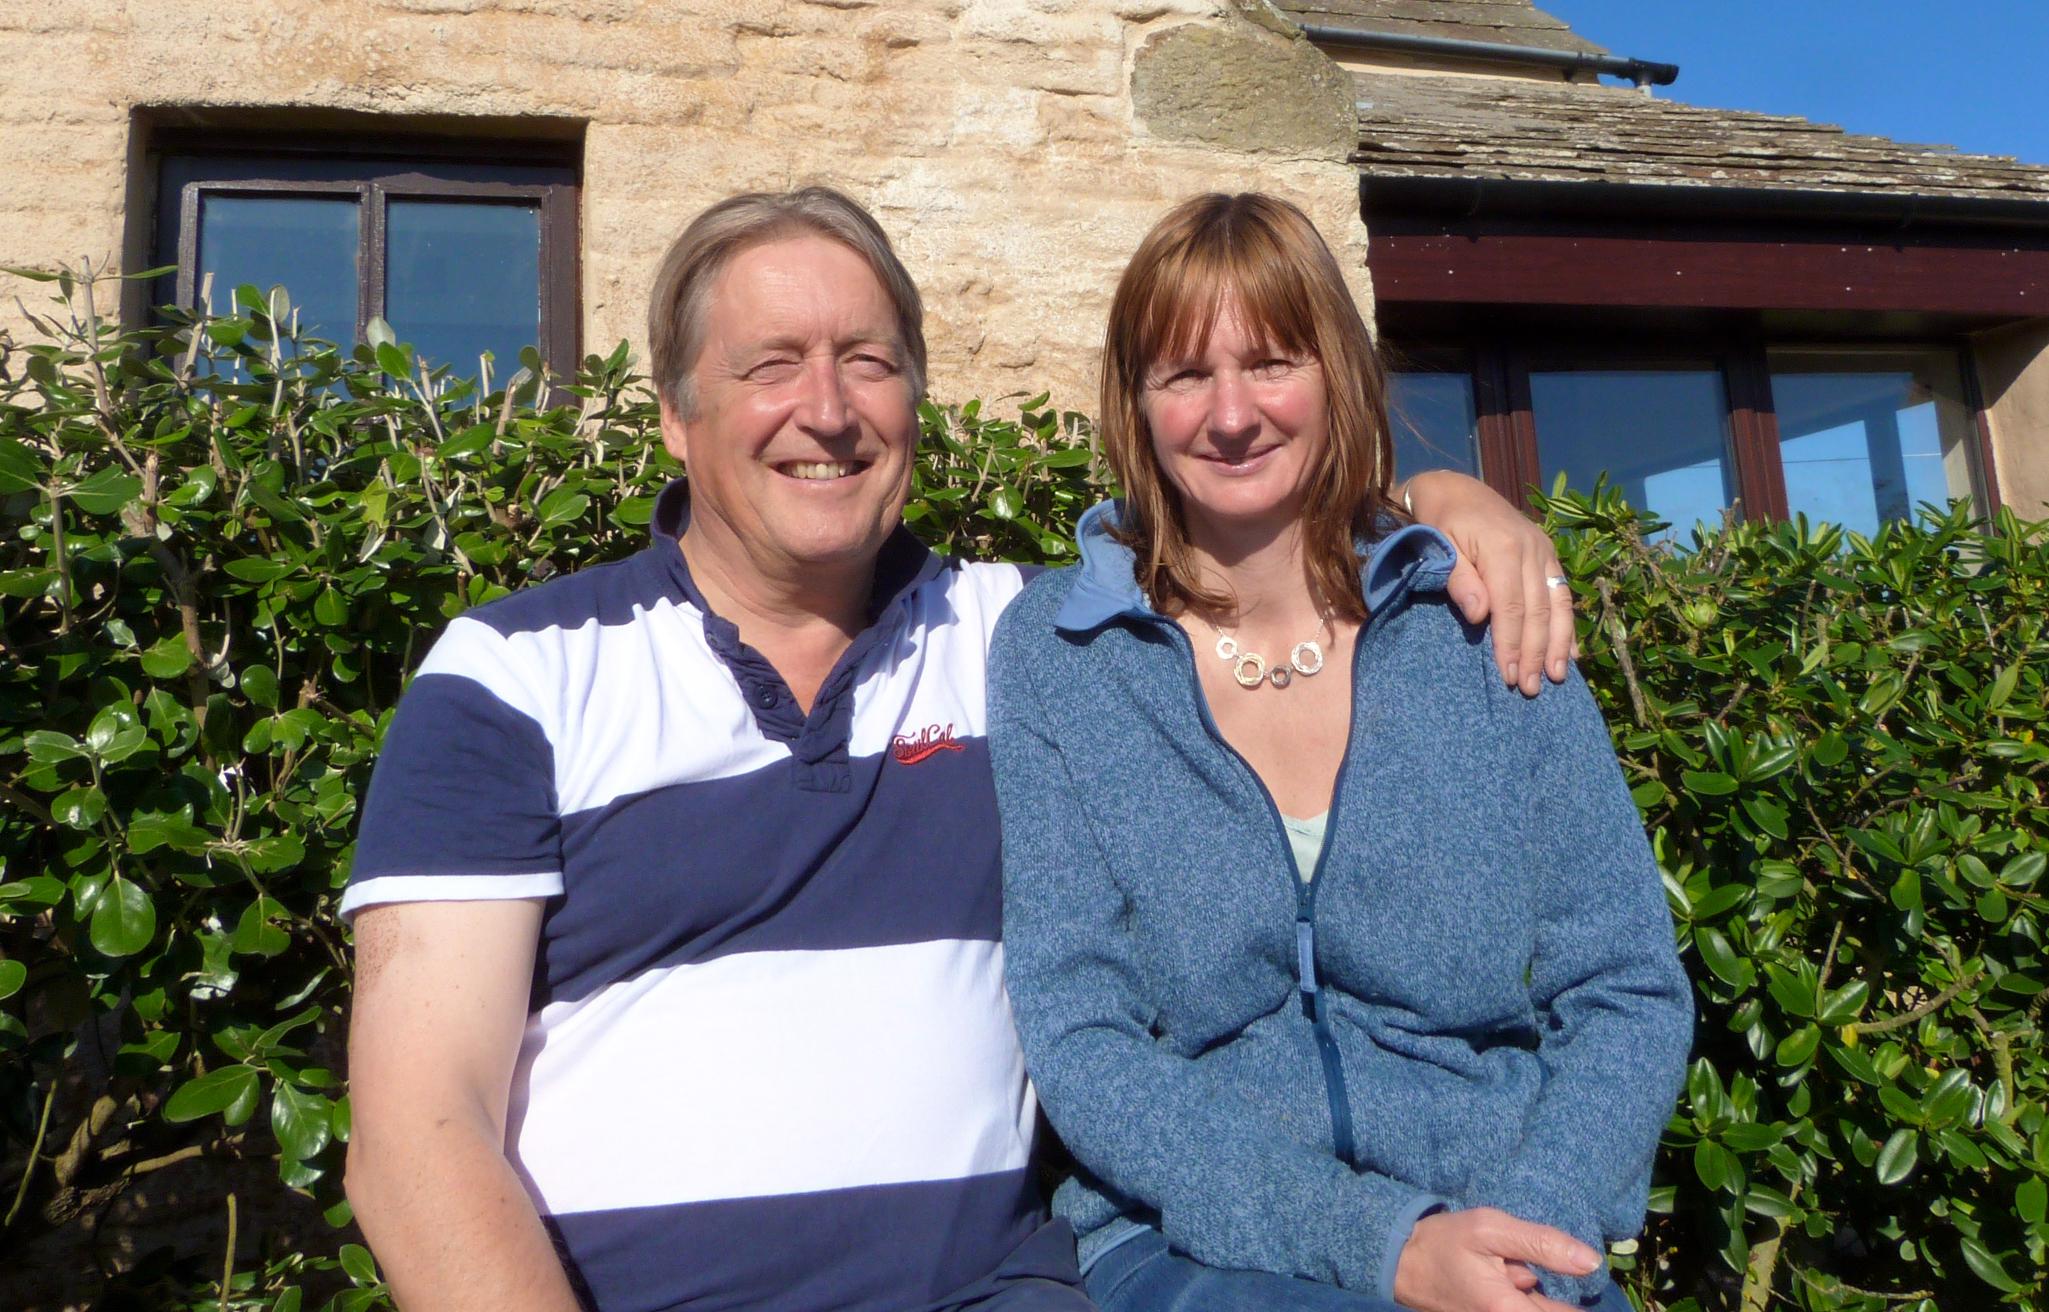 Steve Sankey and wife Sarah